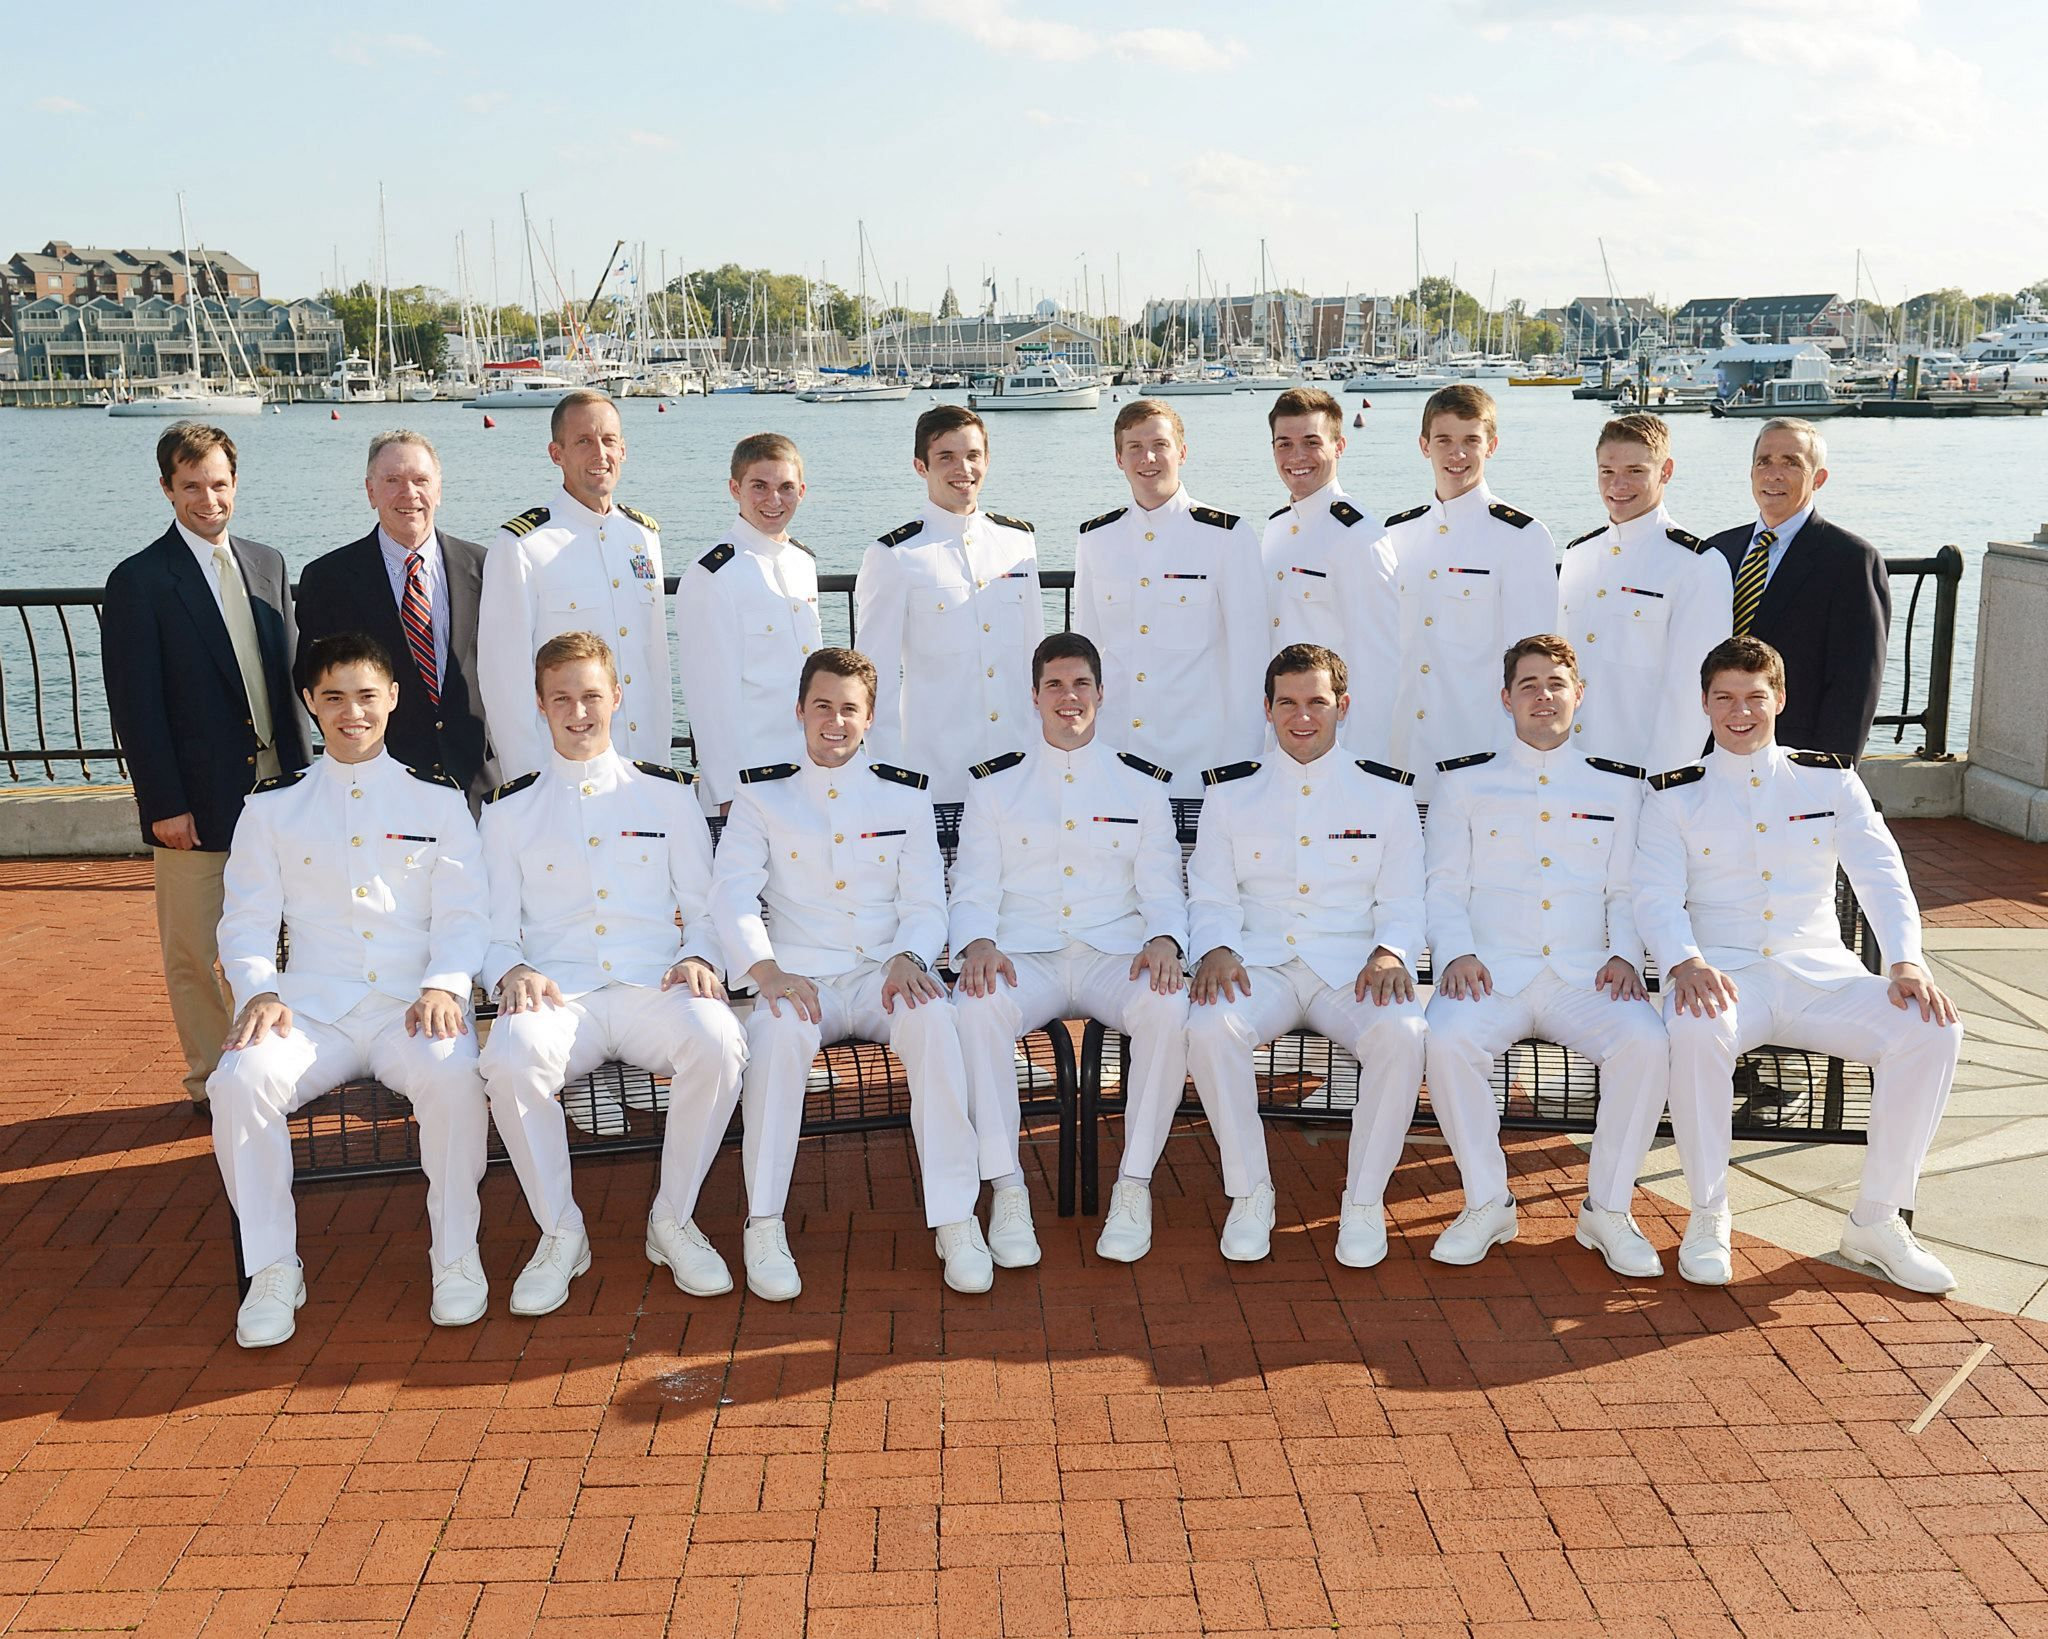 2012 13 Navy Squash Team United States Naval Academy Naval Academy Naval